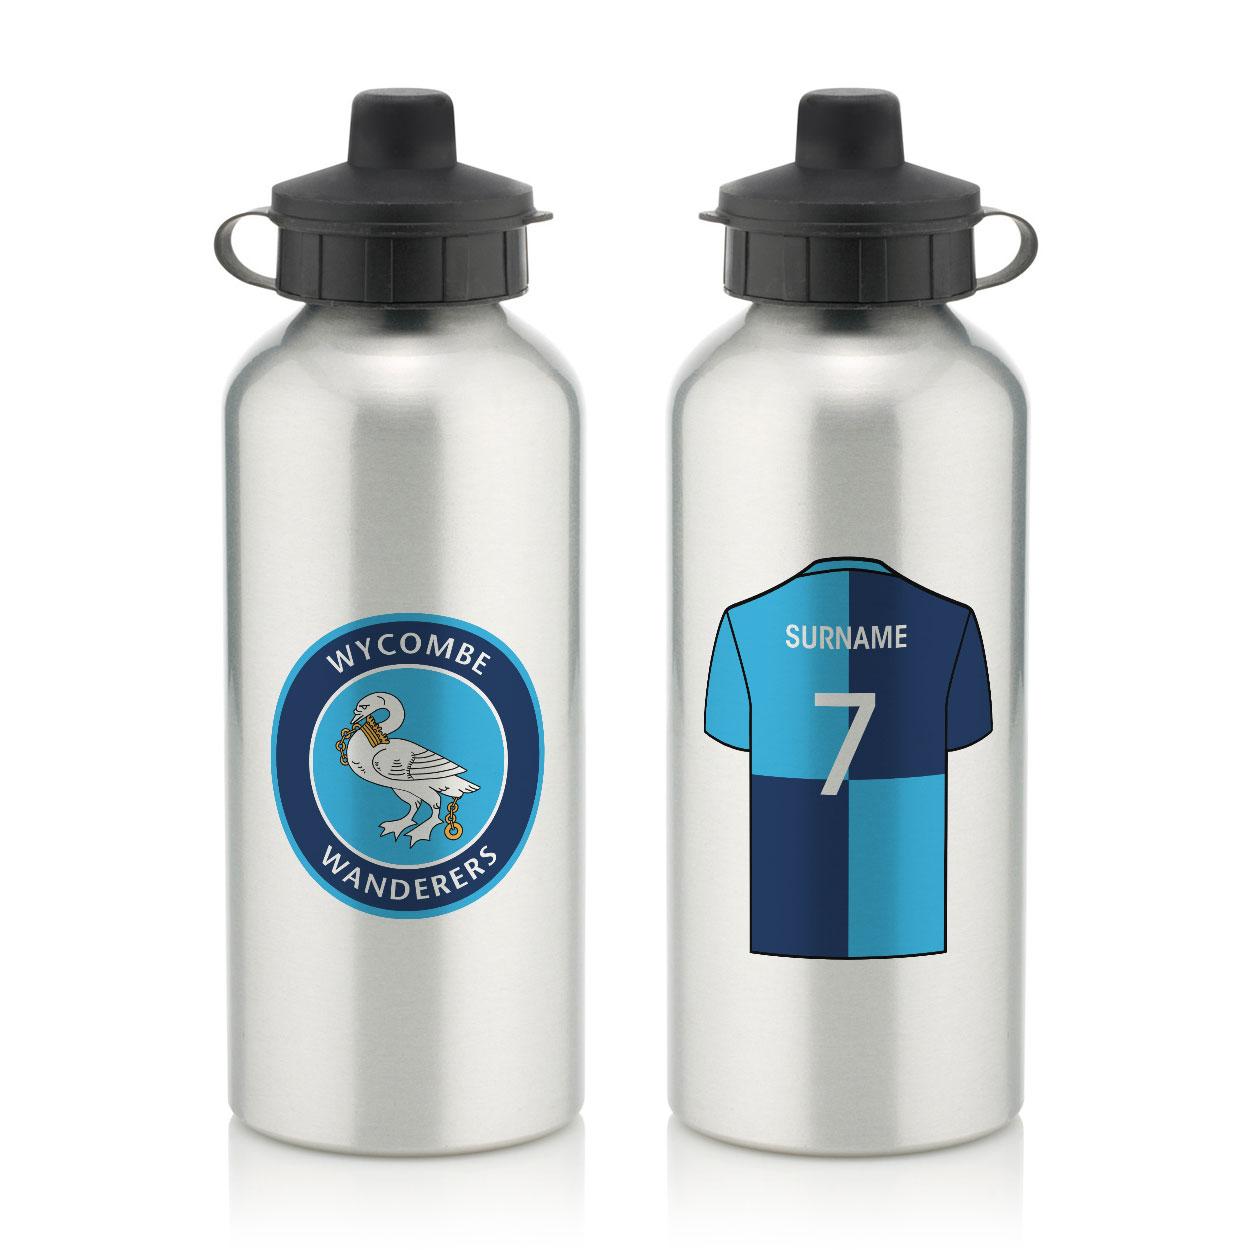 Wycombe Wanderers Aluminium Water Bottle